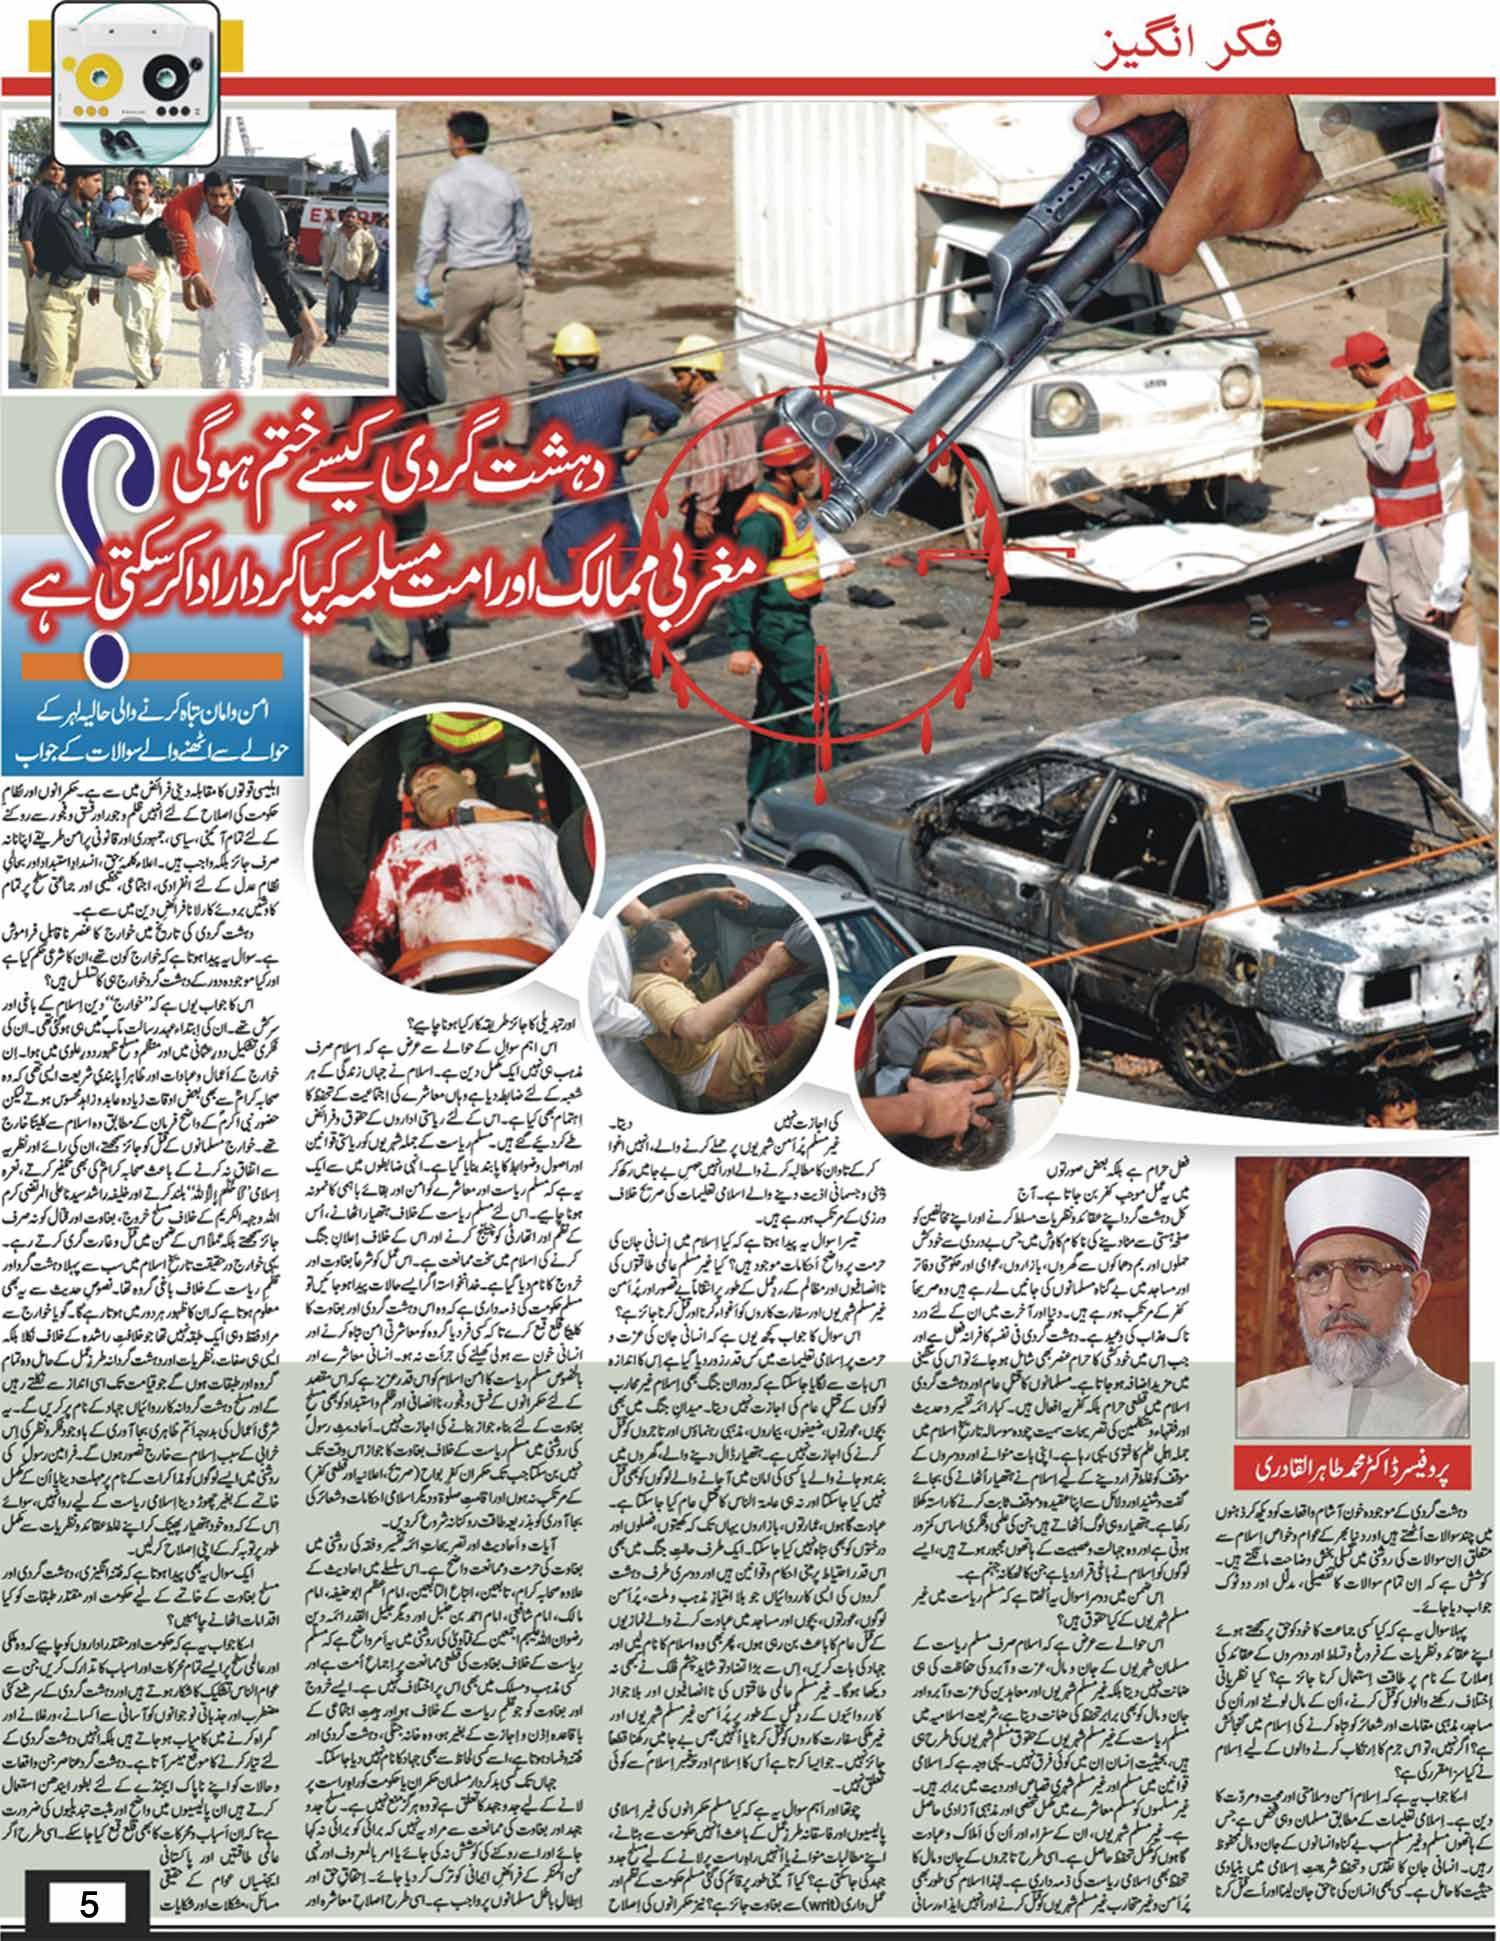 Minhaj-ul-Quran  Print Media CoverageSunday Magazine Pakistan Page: 5